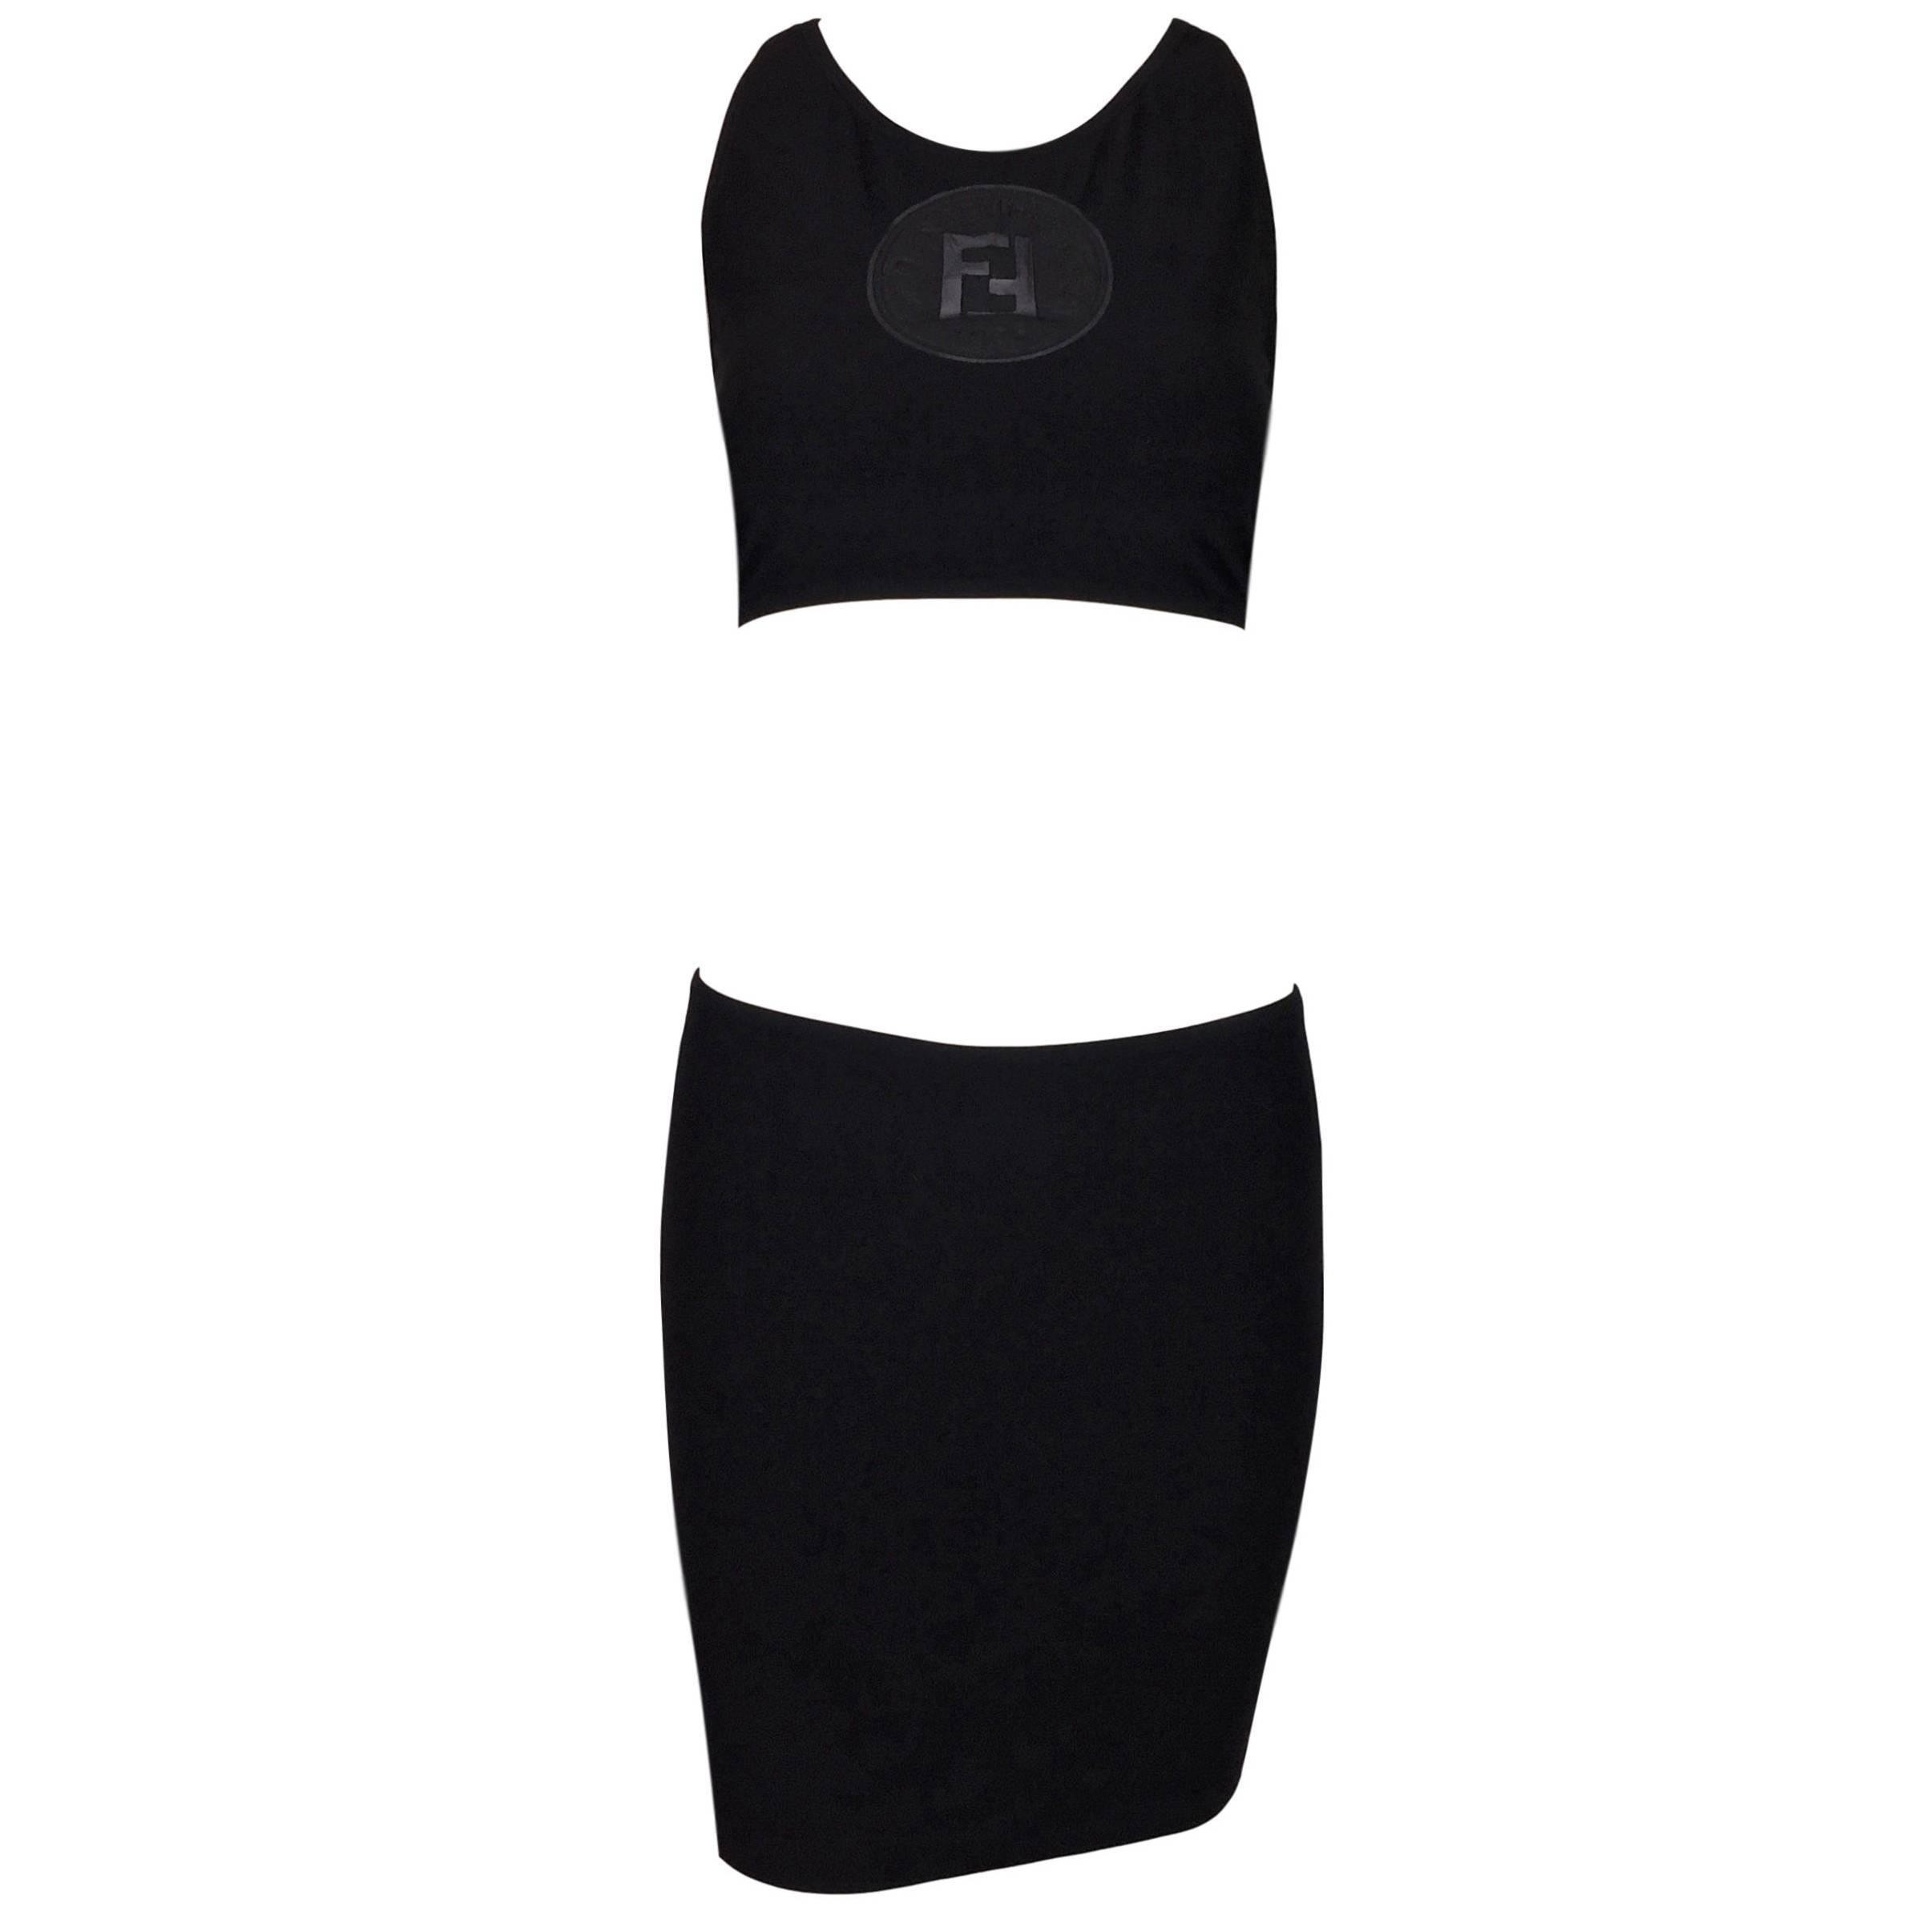 754ca1634ba NWT 1990 s Fendi Black Sheer Monogram Logo Crop Top and Mini Skirt at  1stdibs